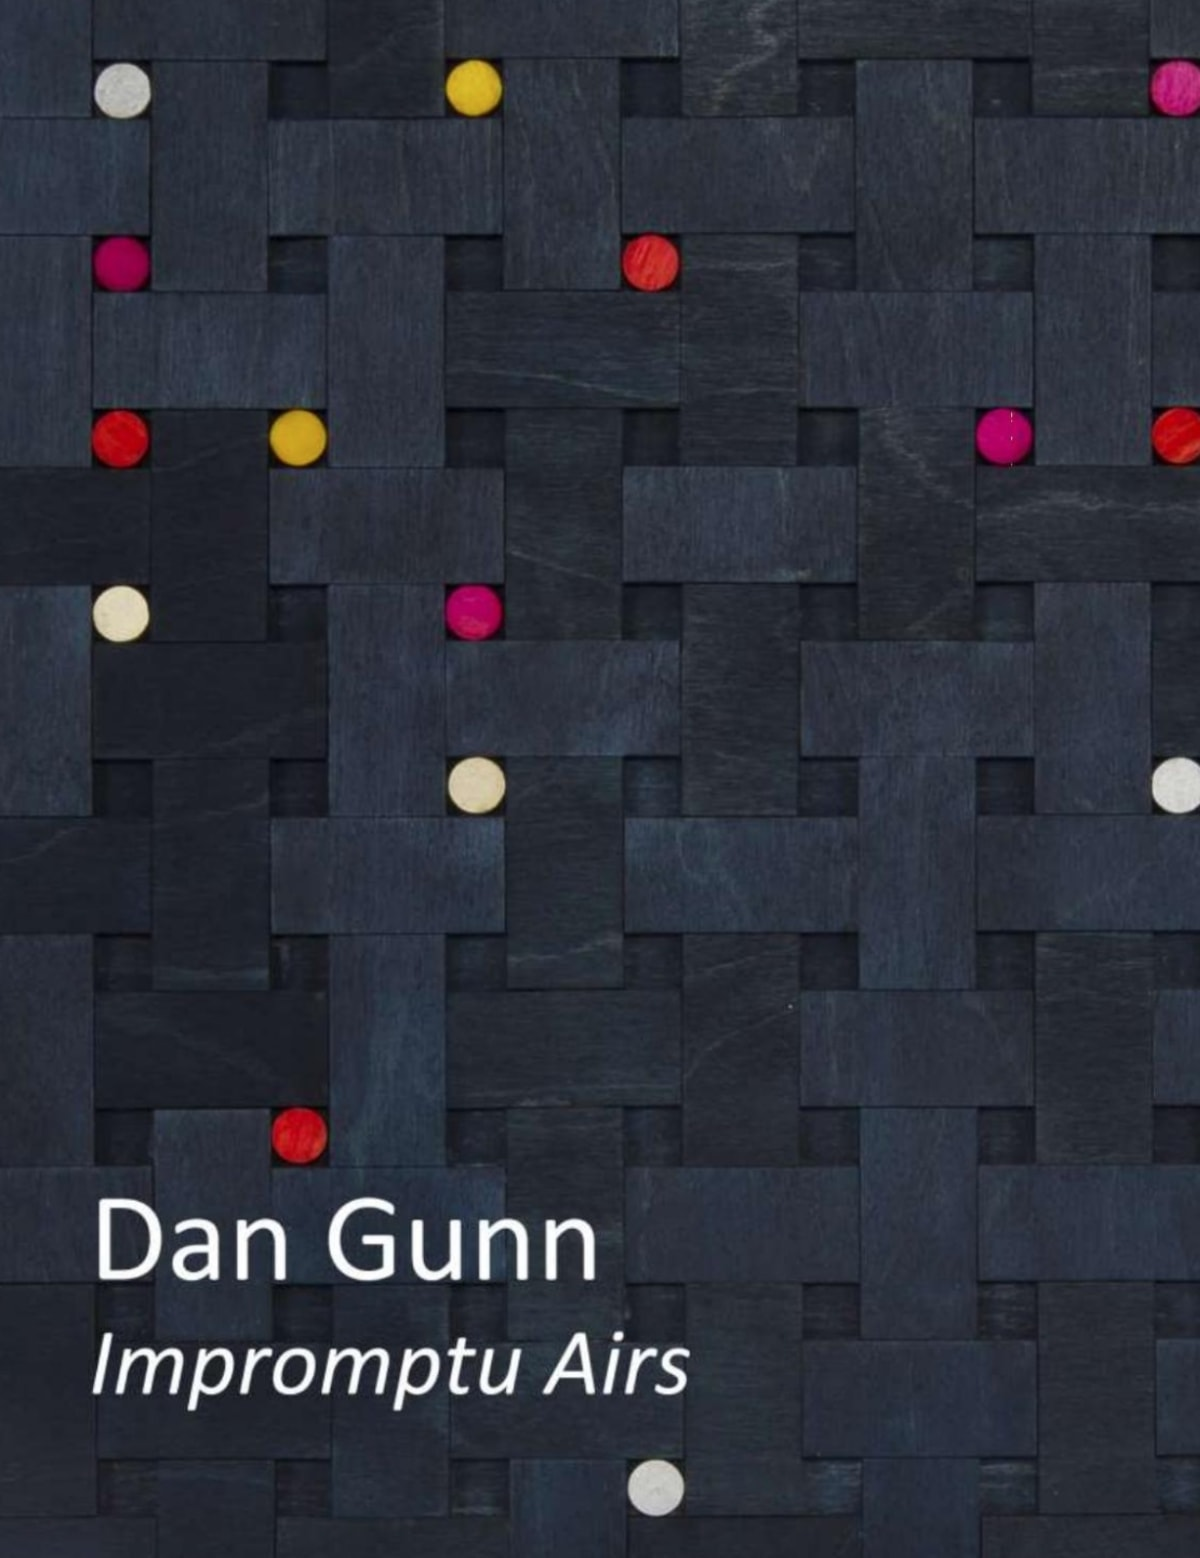 Dan Gunn: Impromptu Airs